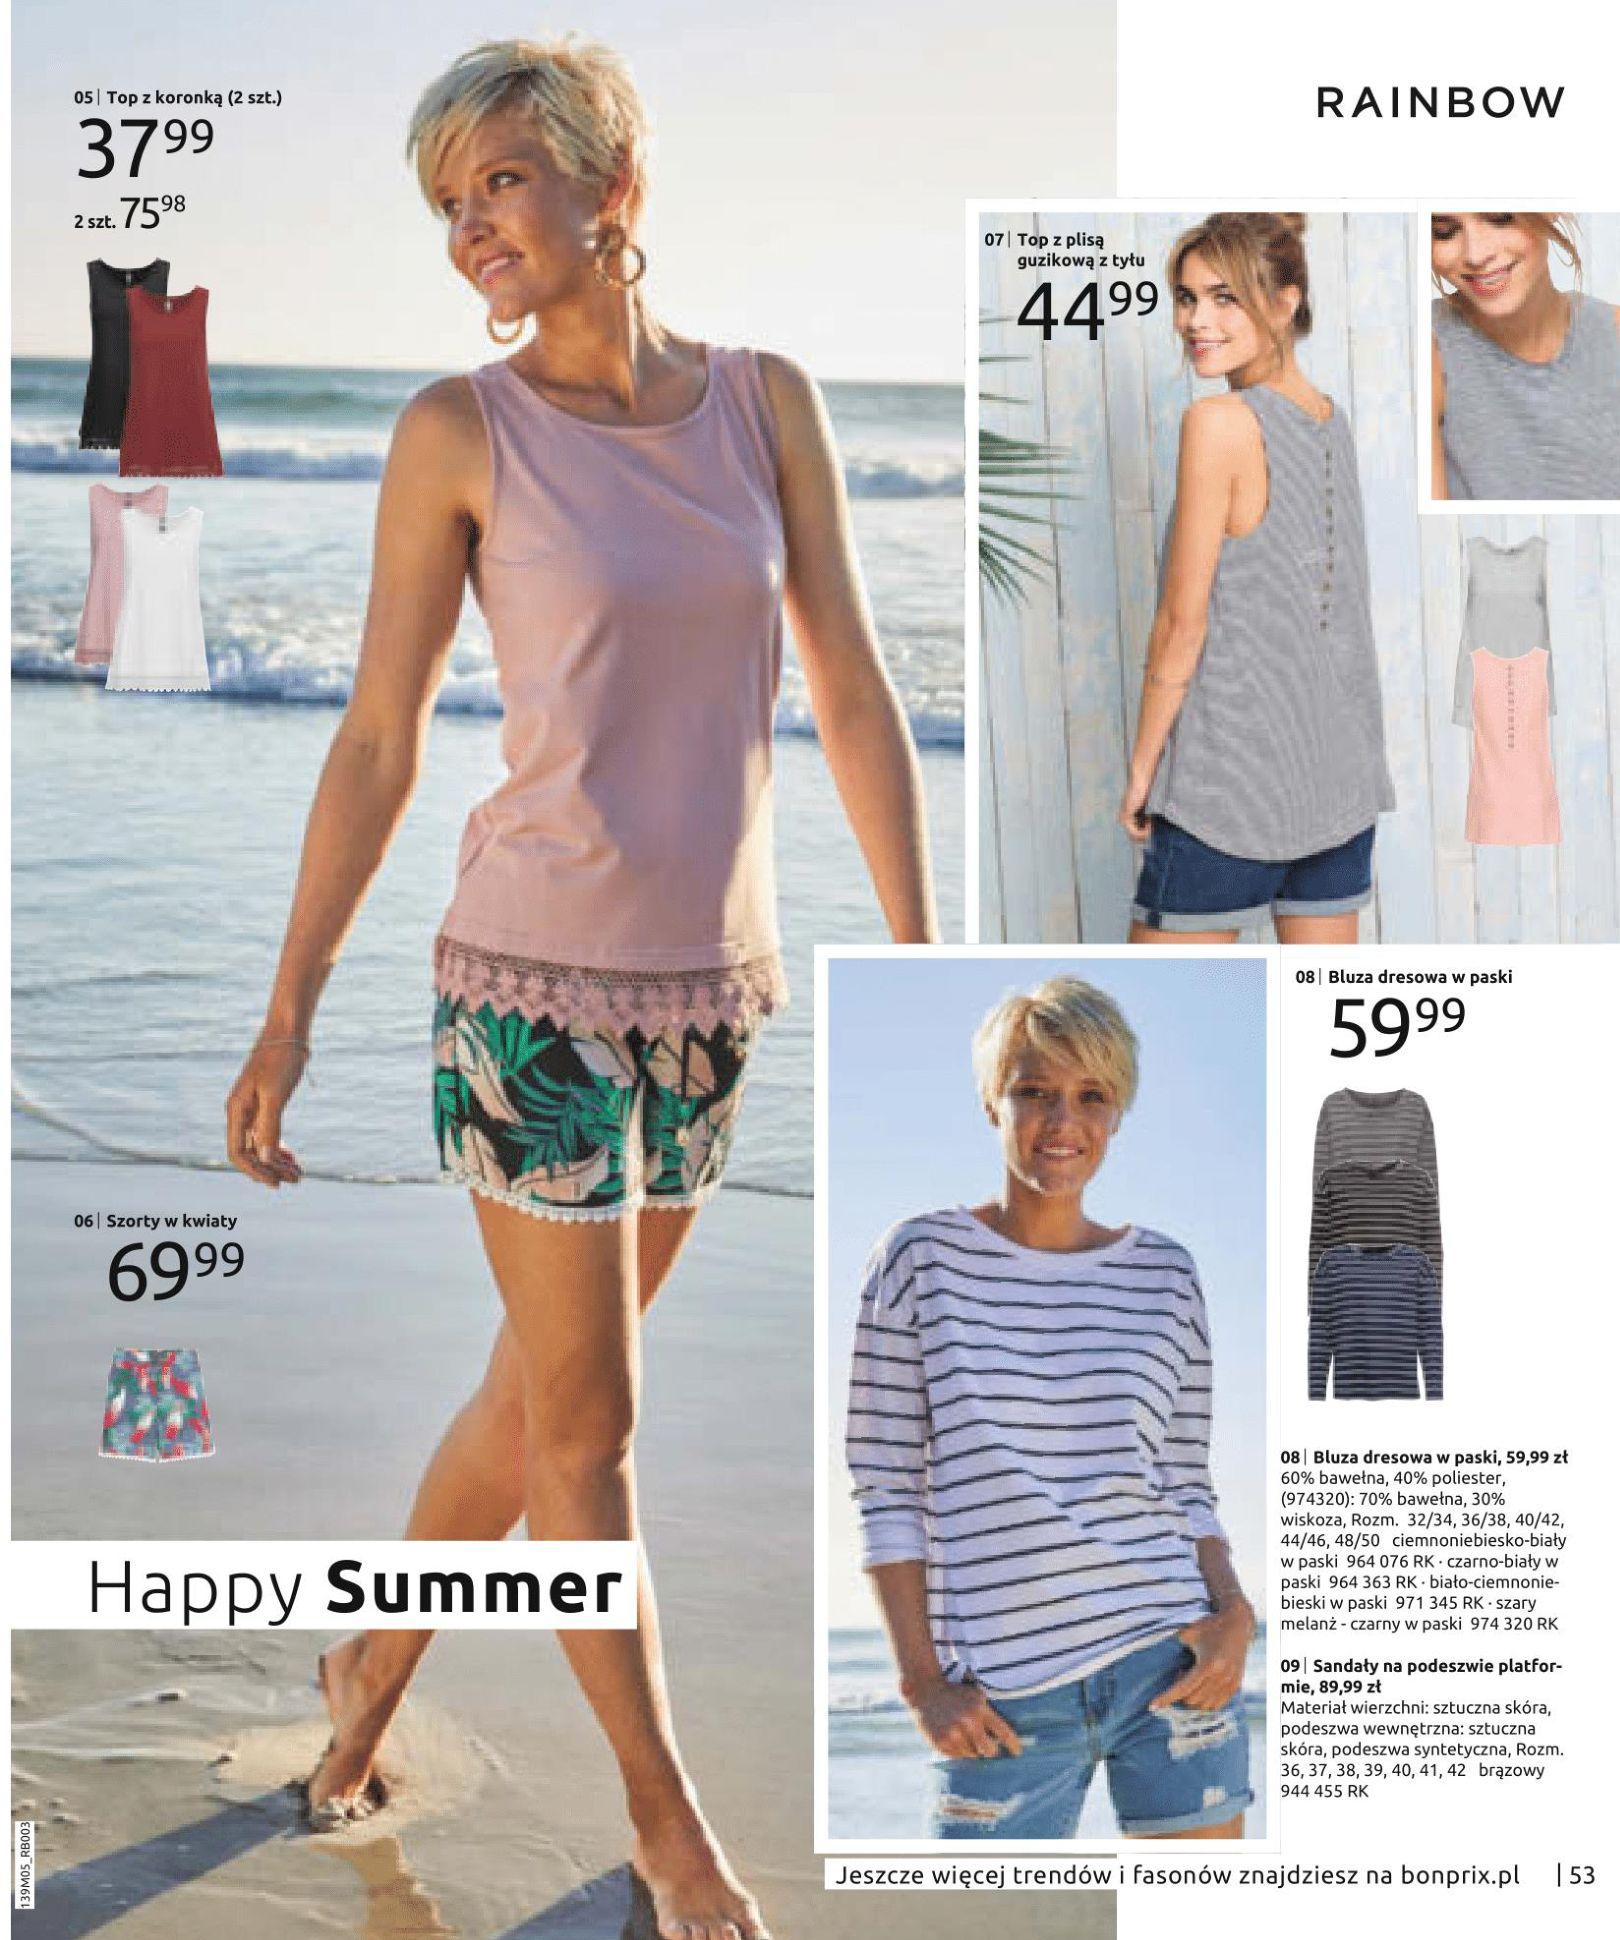 Gazetka Bonprix - Romantic Summer-02.07.2019-29.10.2019-page-55